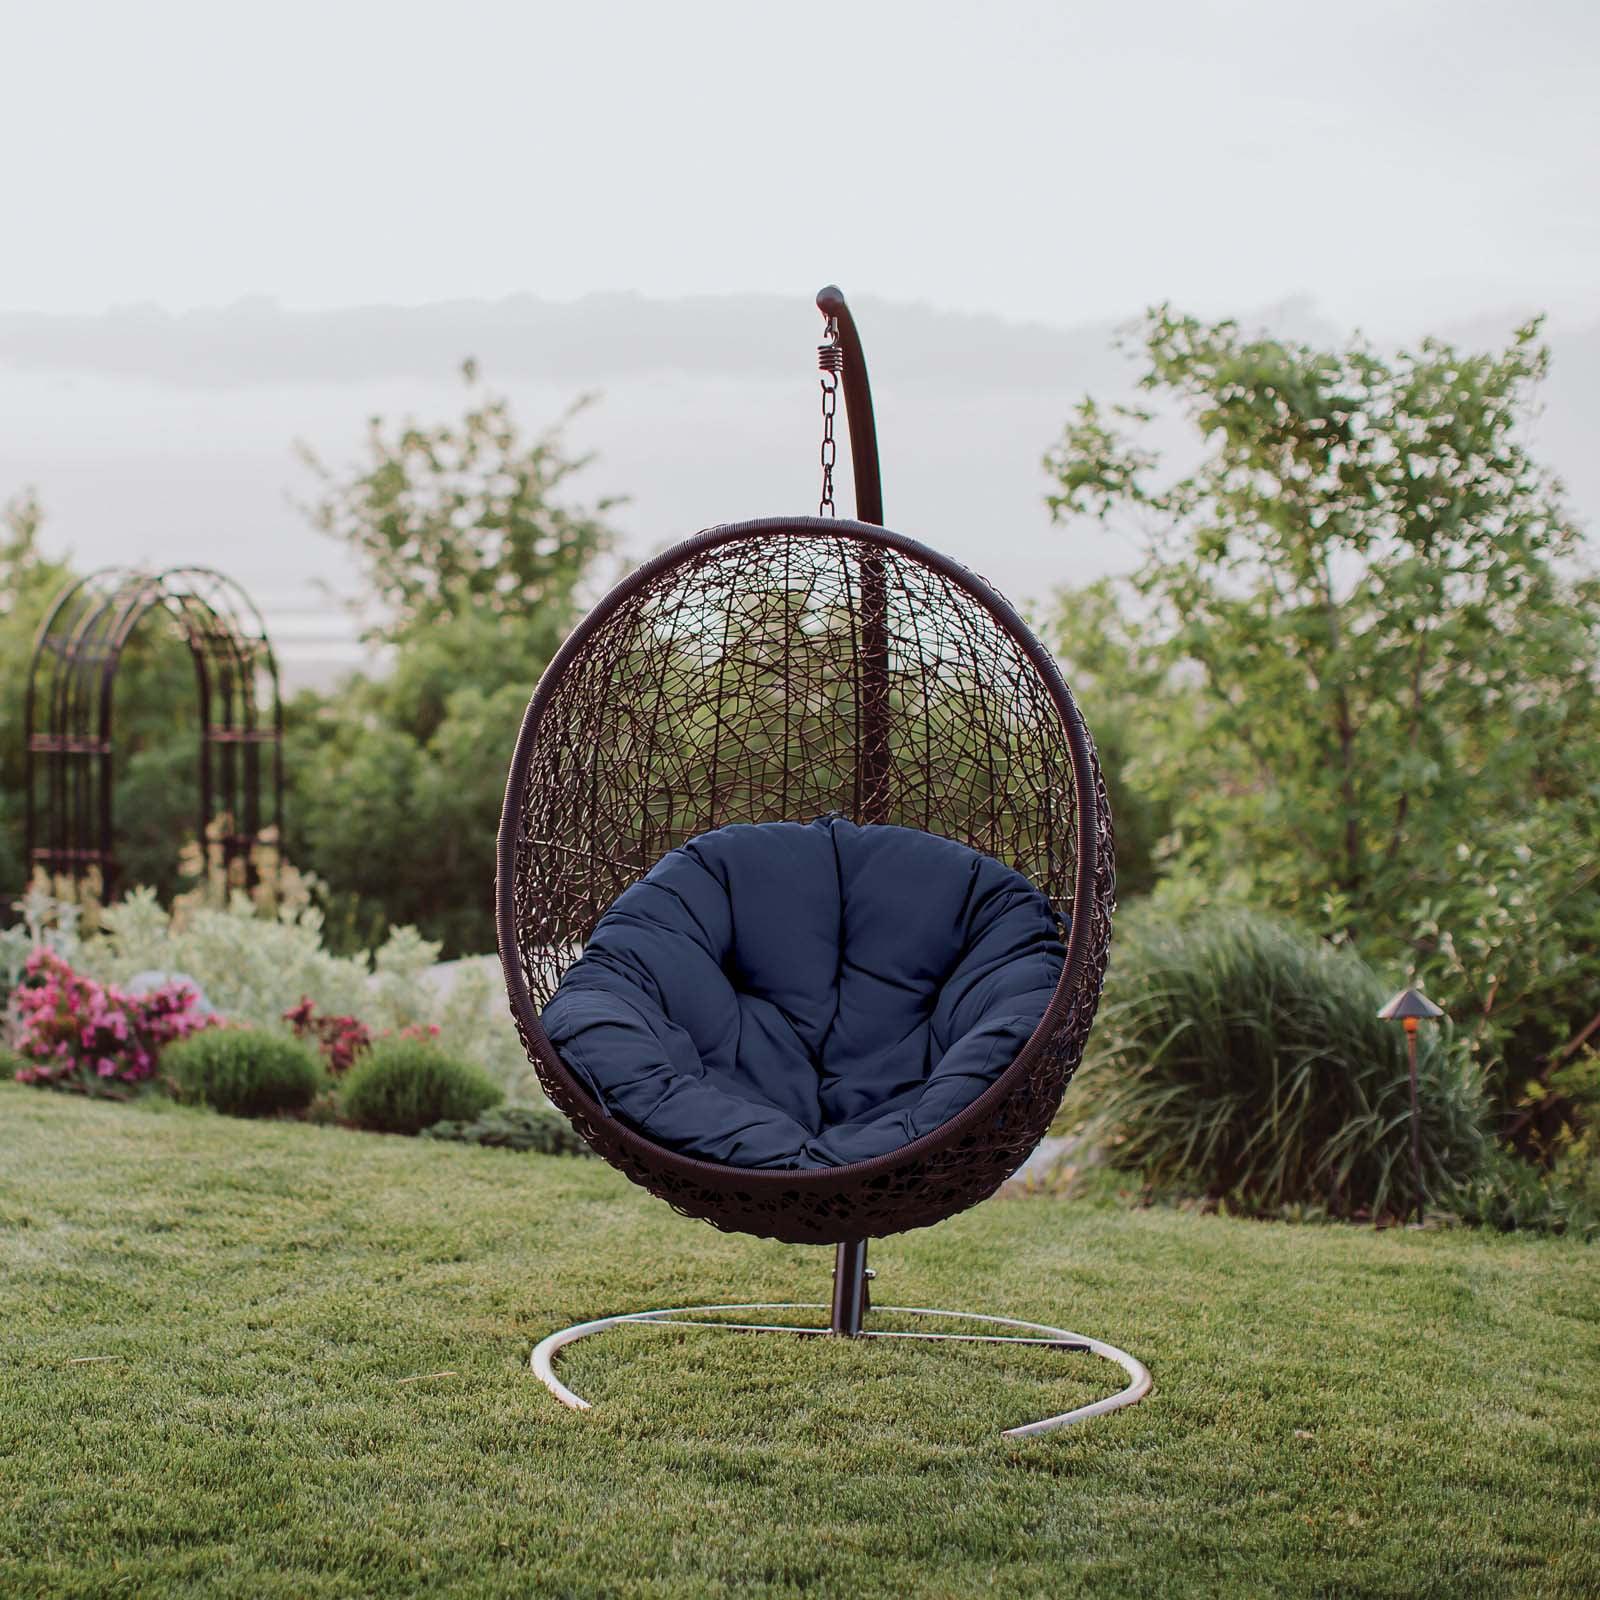 Modway Encase Outdoor Patio Swing Lounge Chair, Multiple Colors